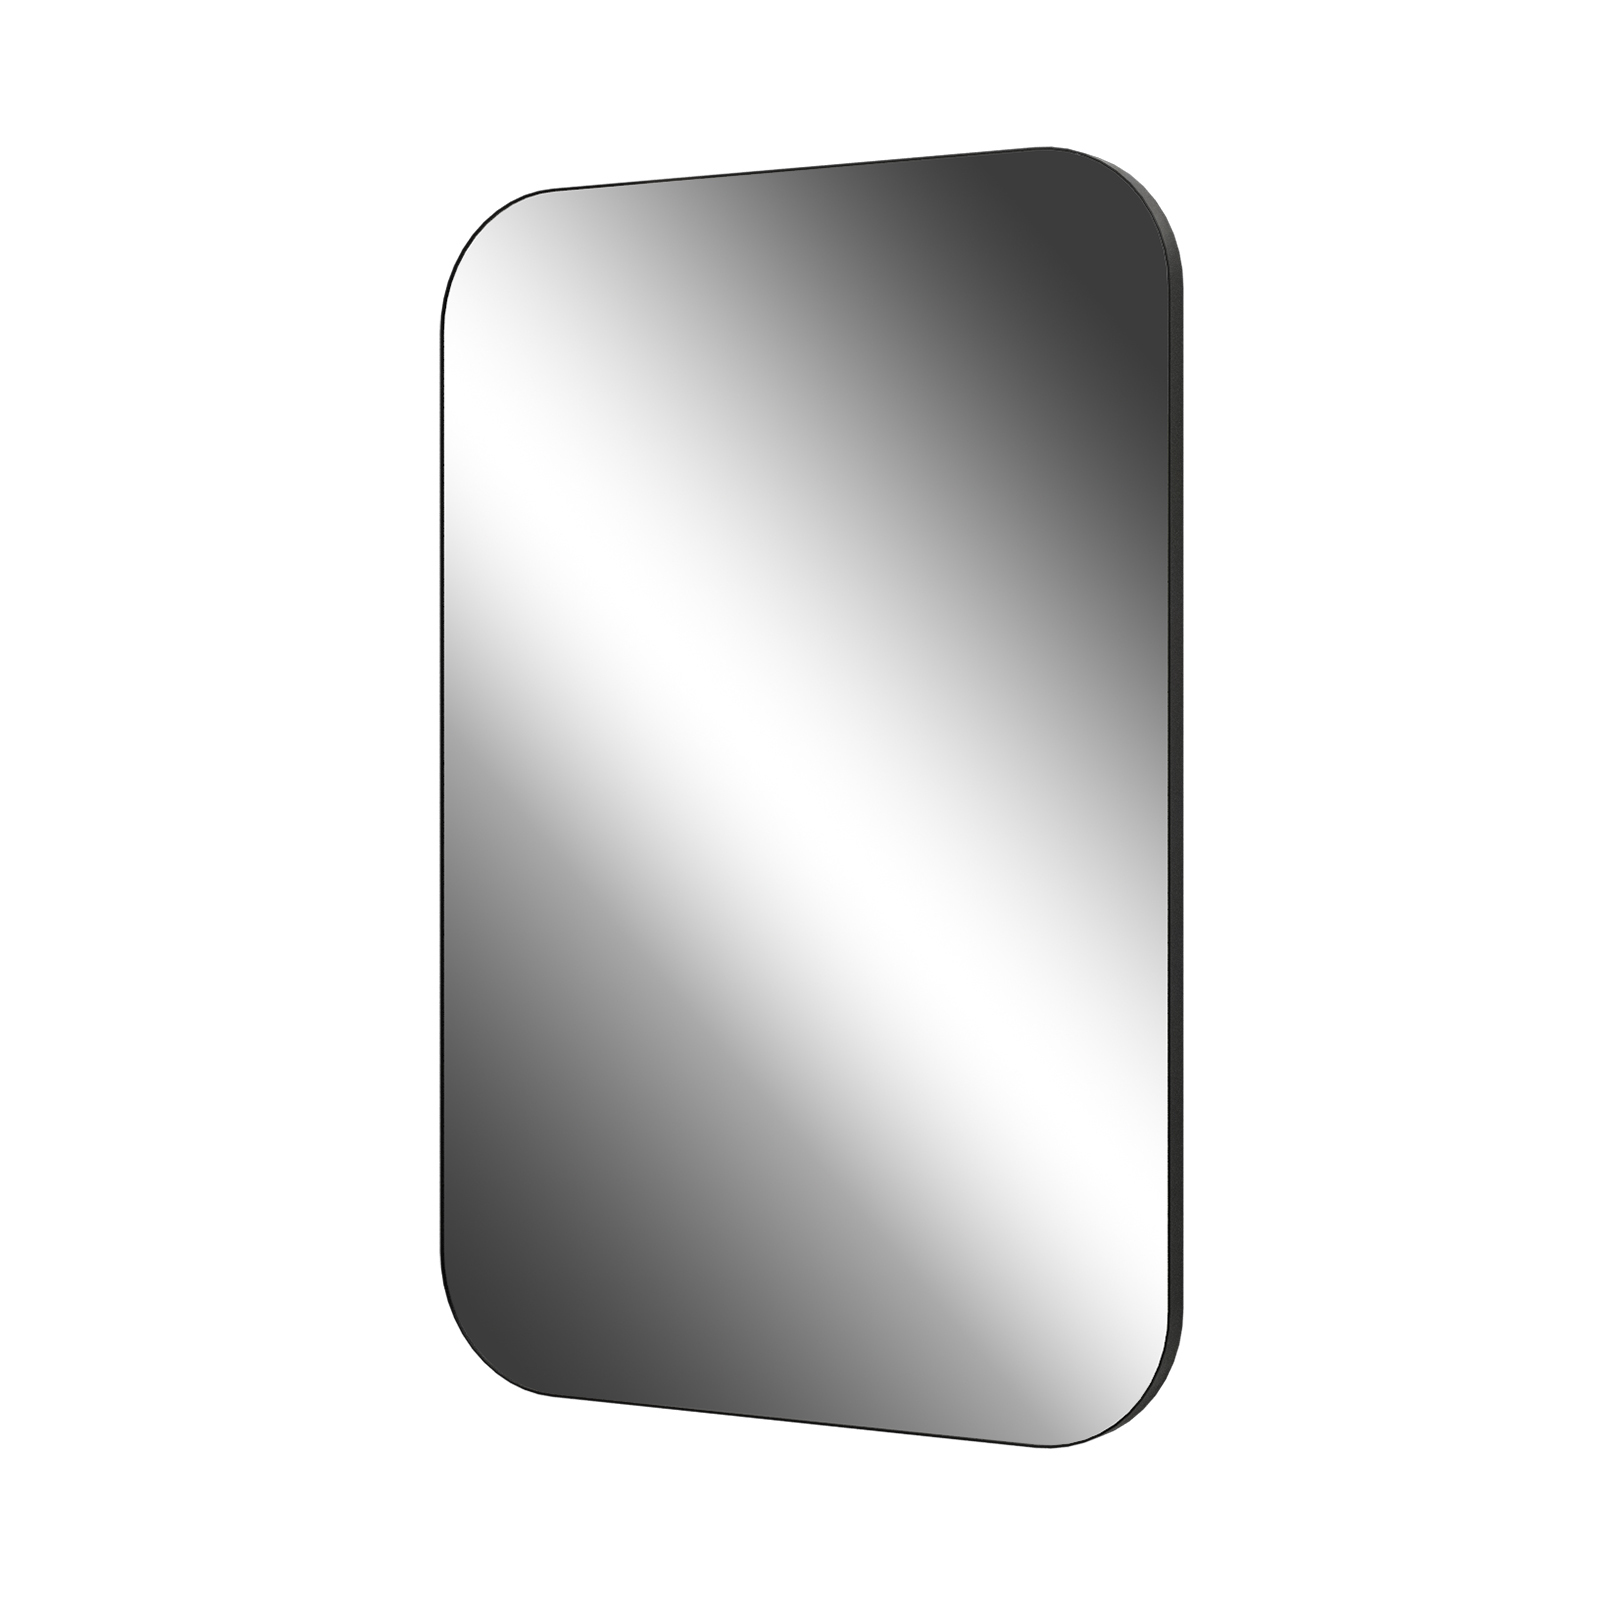 Living Elements 600 x 900 x 23mm Black Framed Rounded Corner Mirror